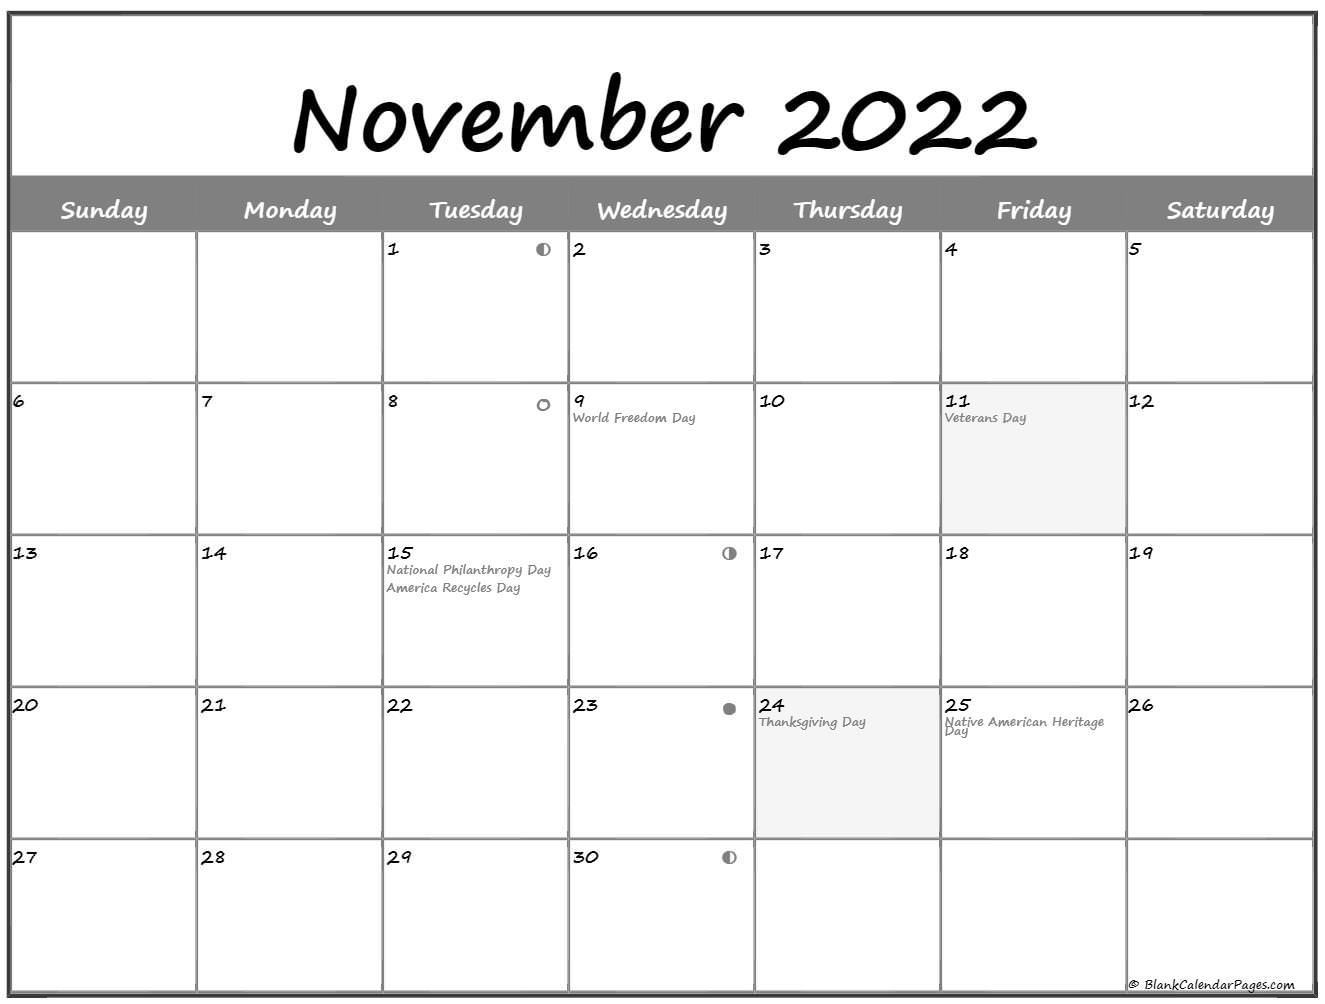 November 2019 Lunar calendar. moon phase calendar with USA holidays